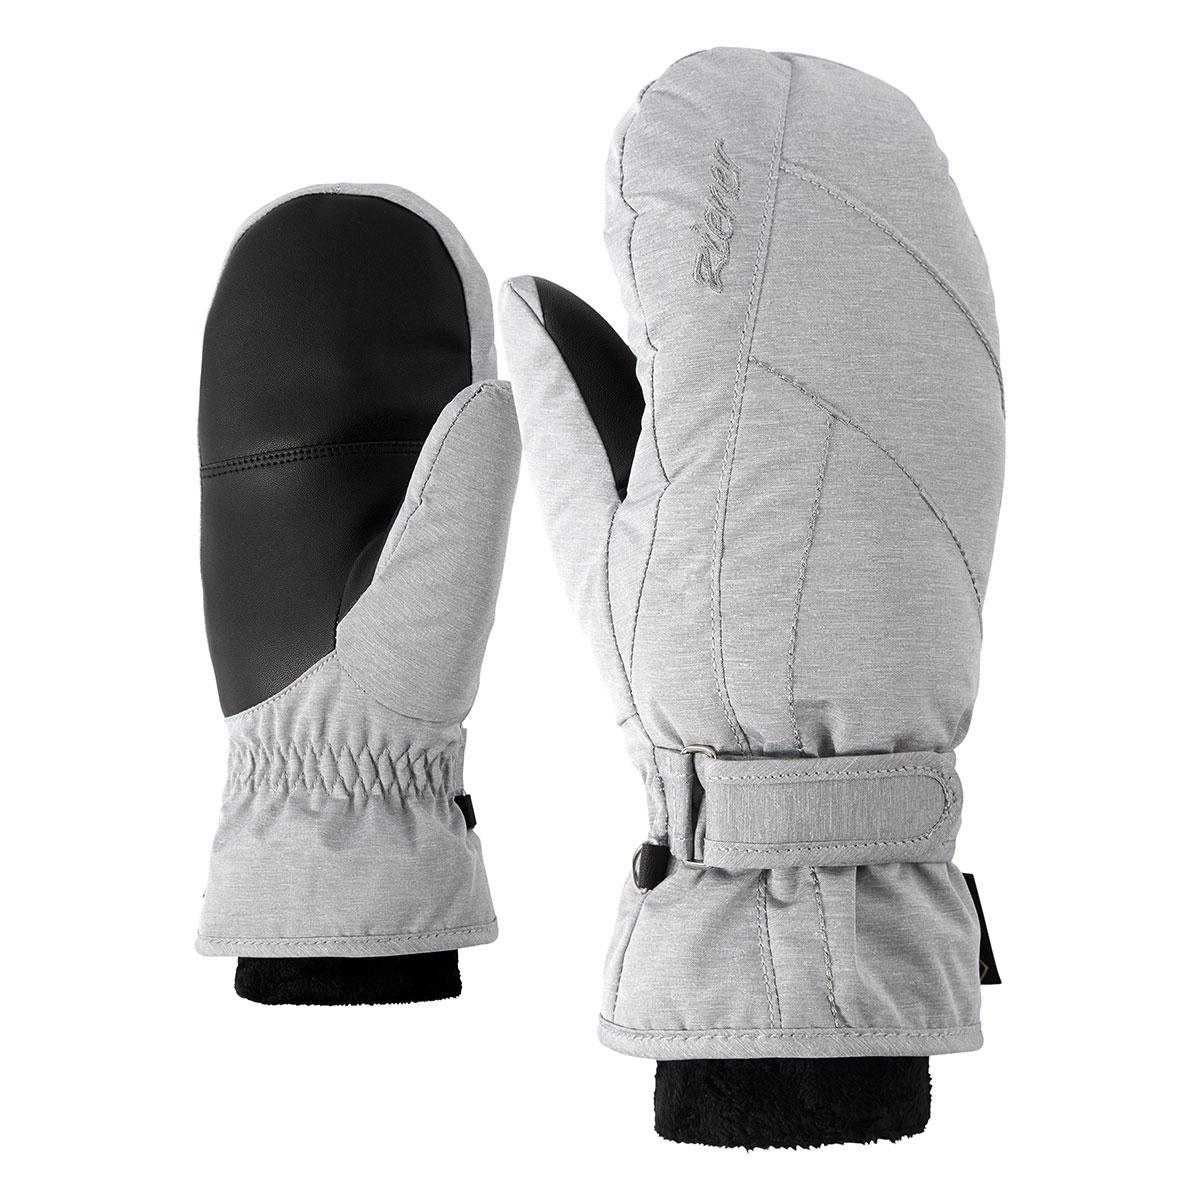 Kim lady glove Ziener grey melange